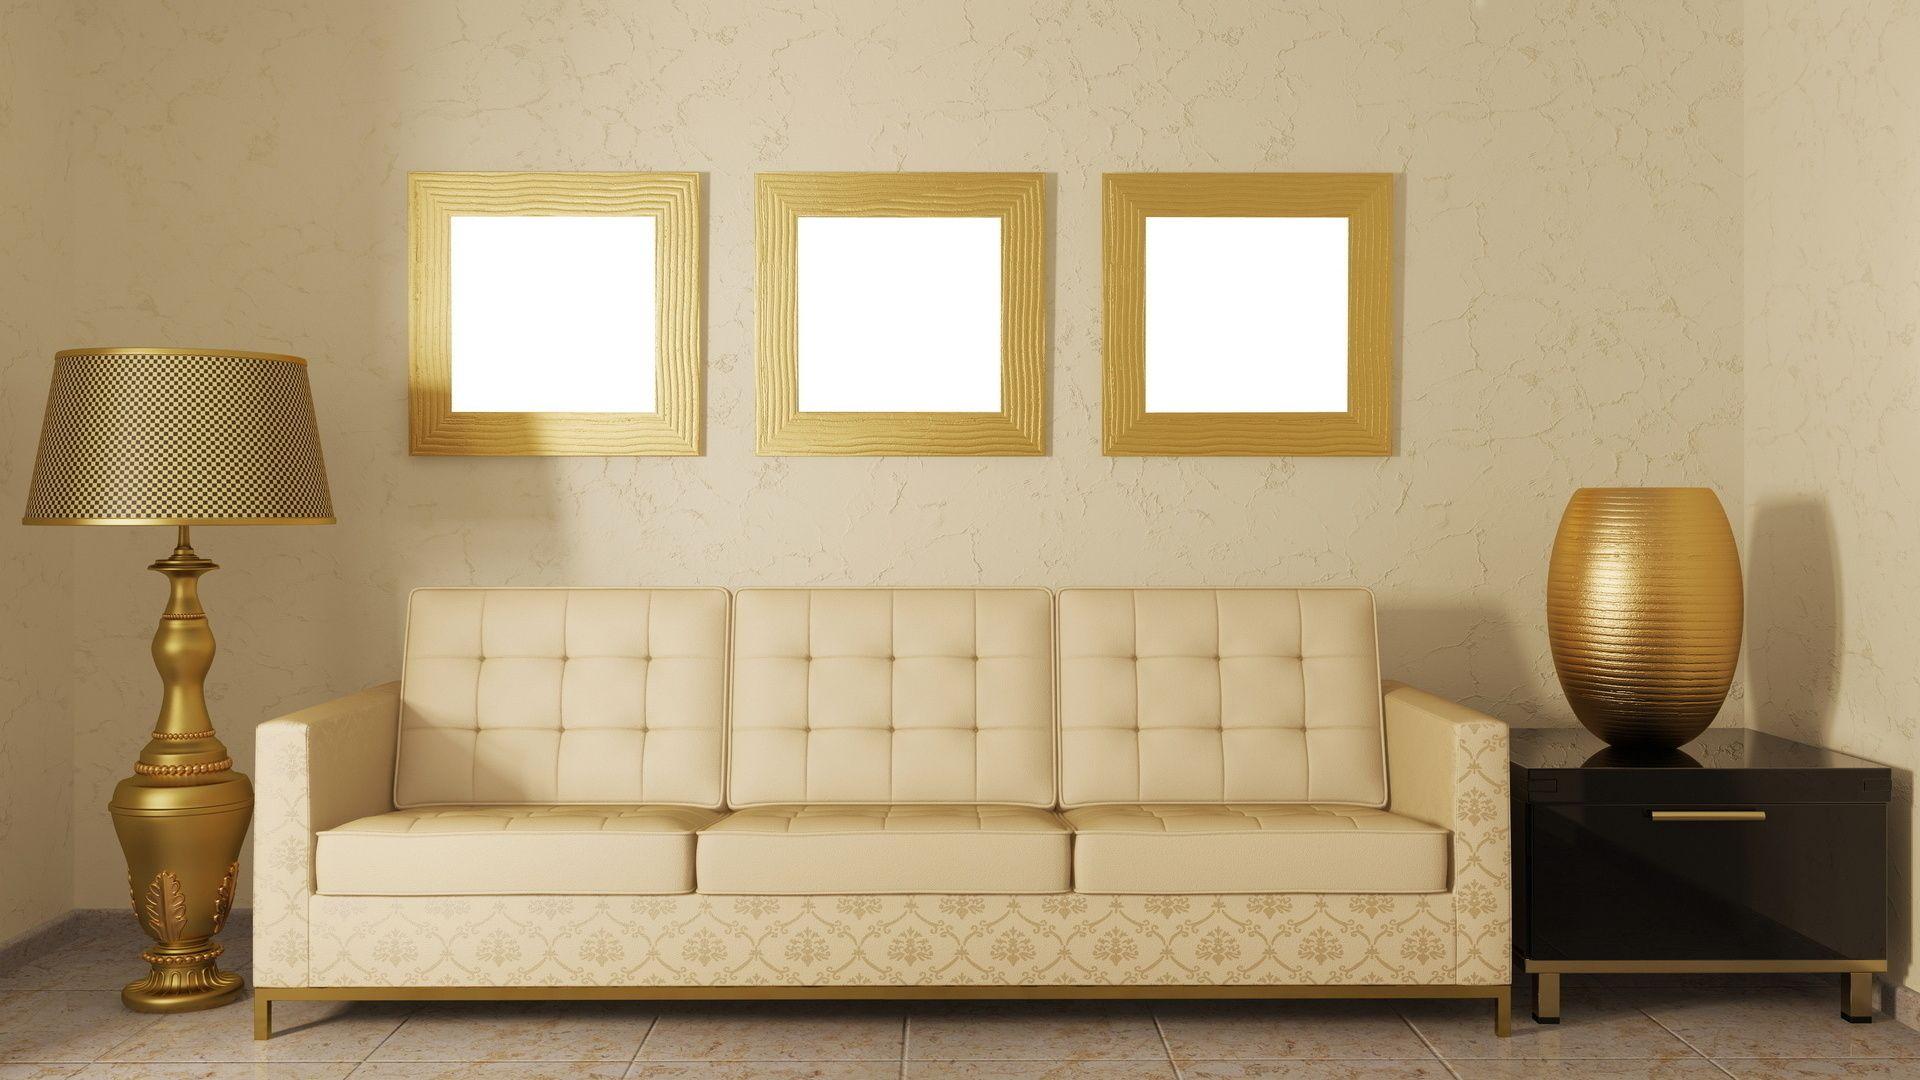 Furniture hd wallpaper for laptop